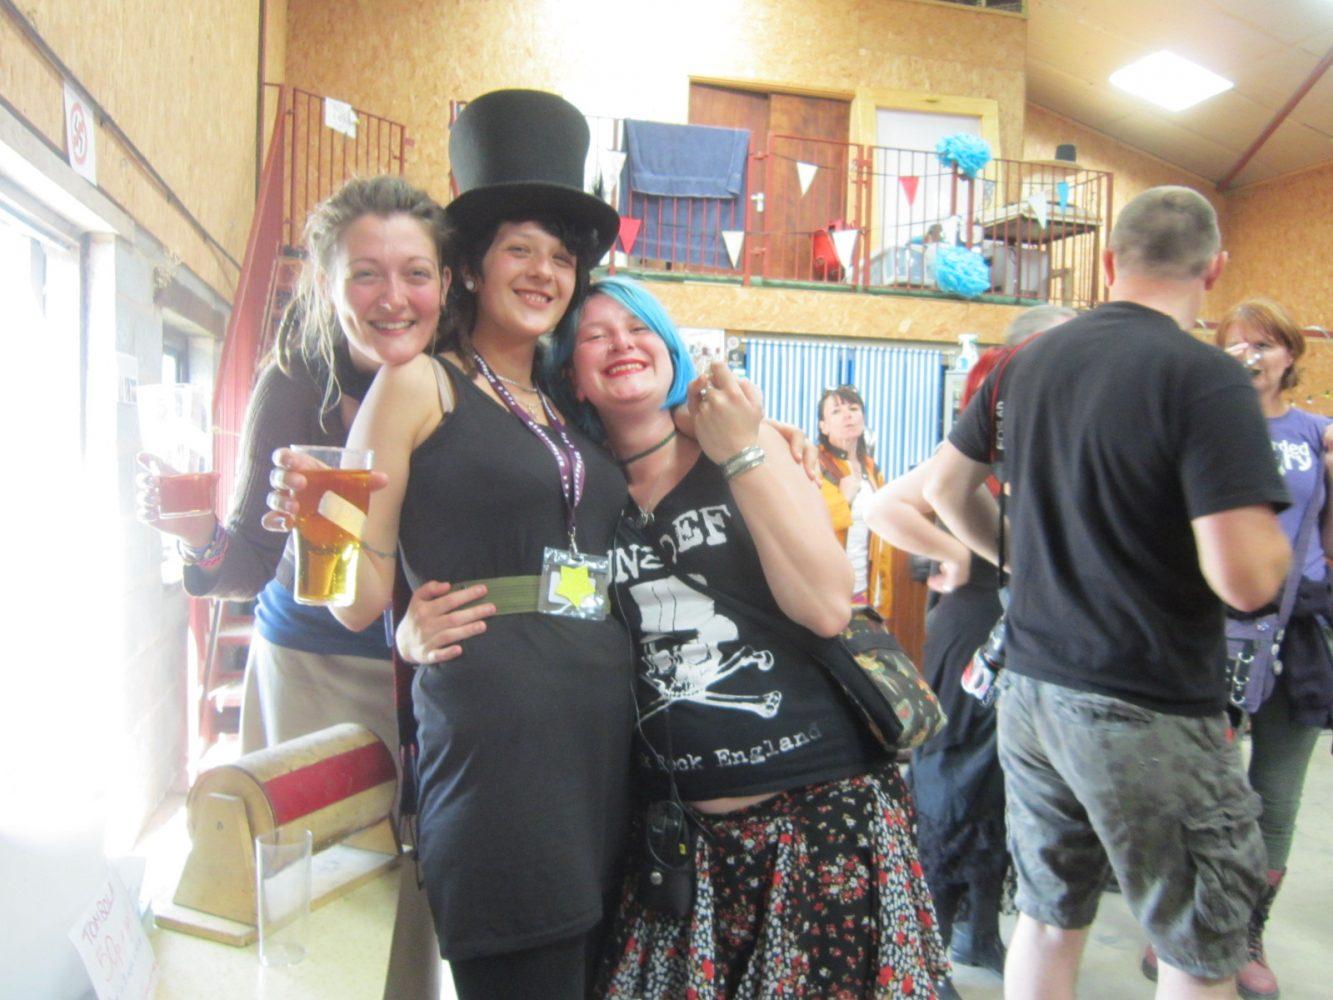 People at Glastonwick Festival